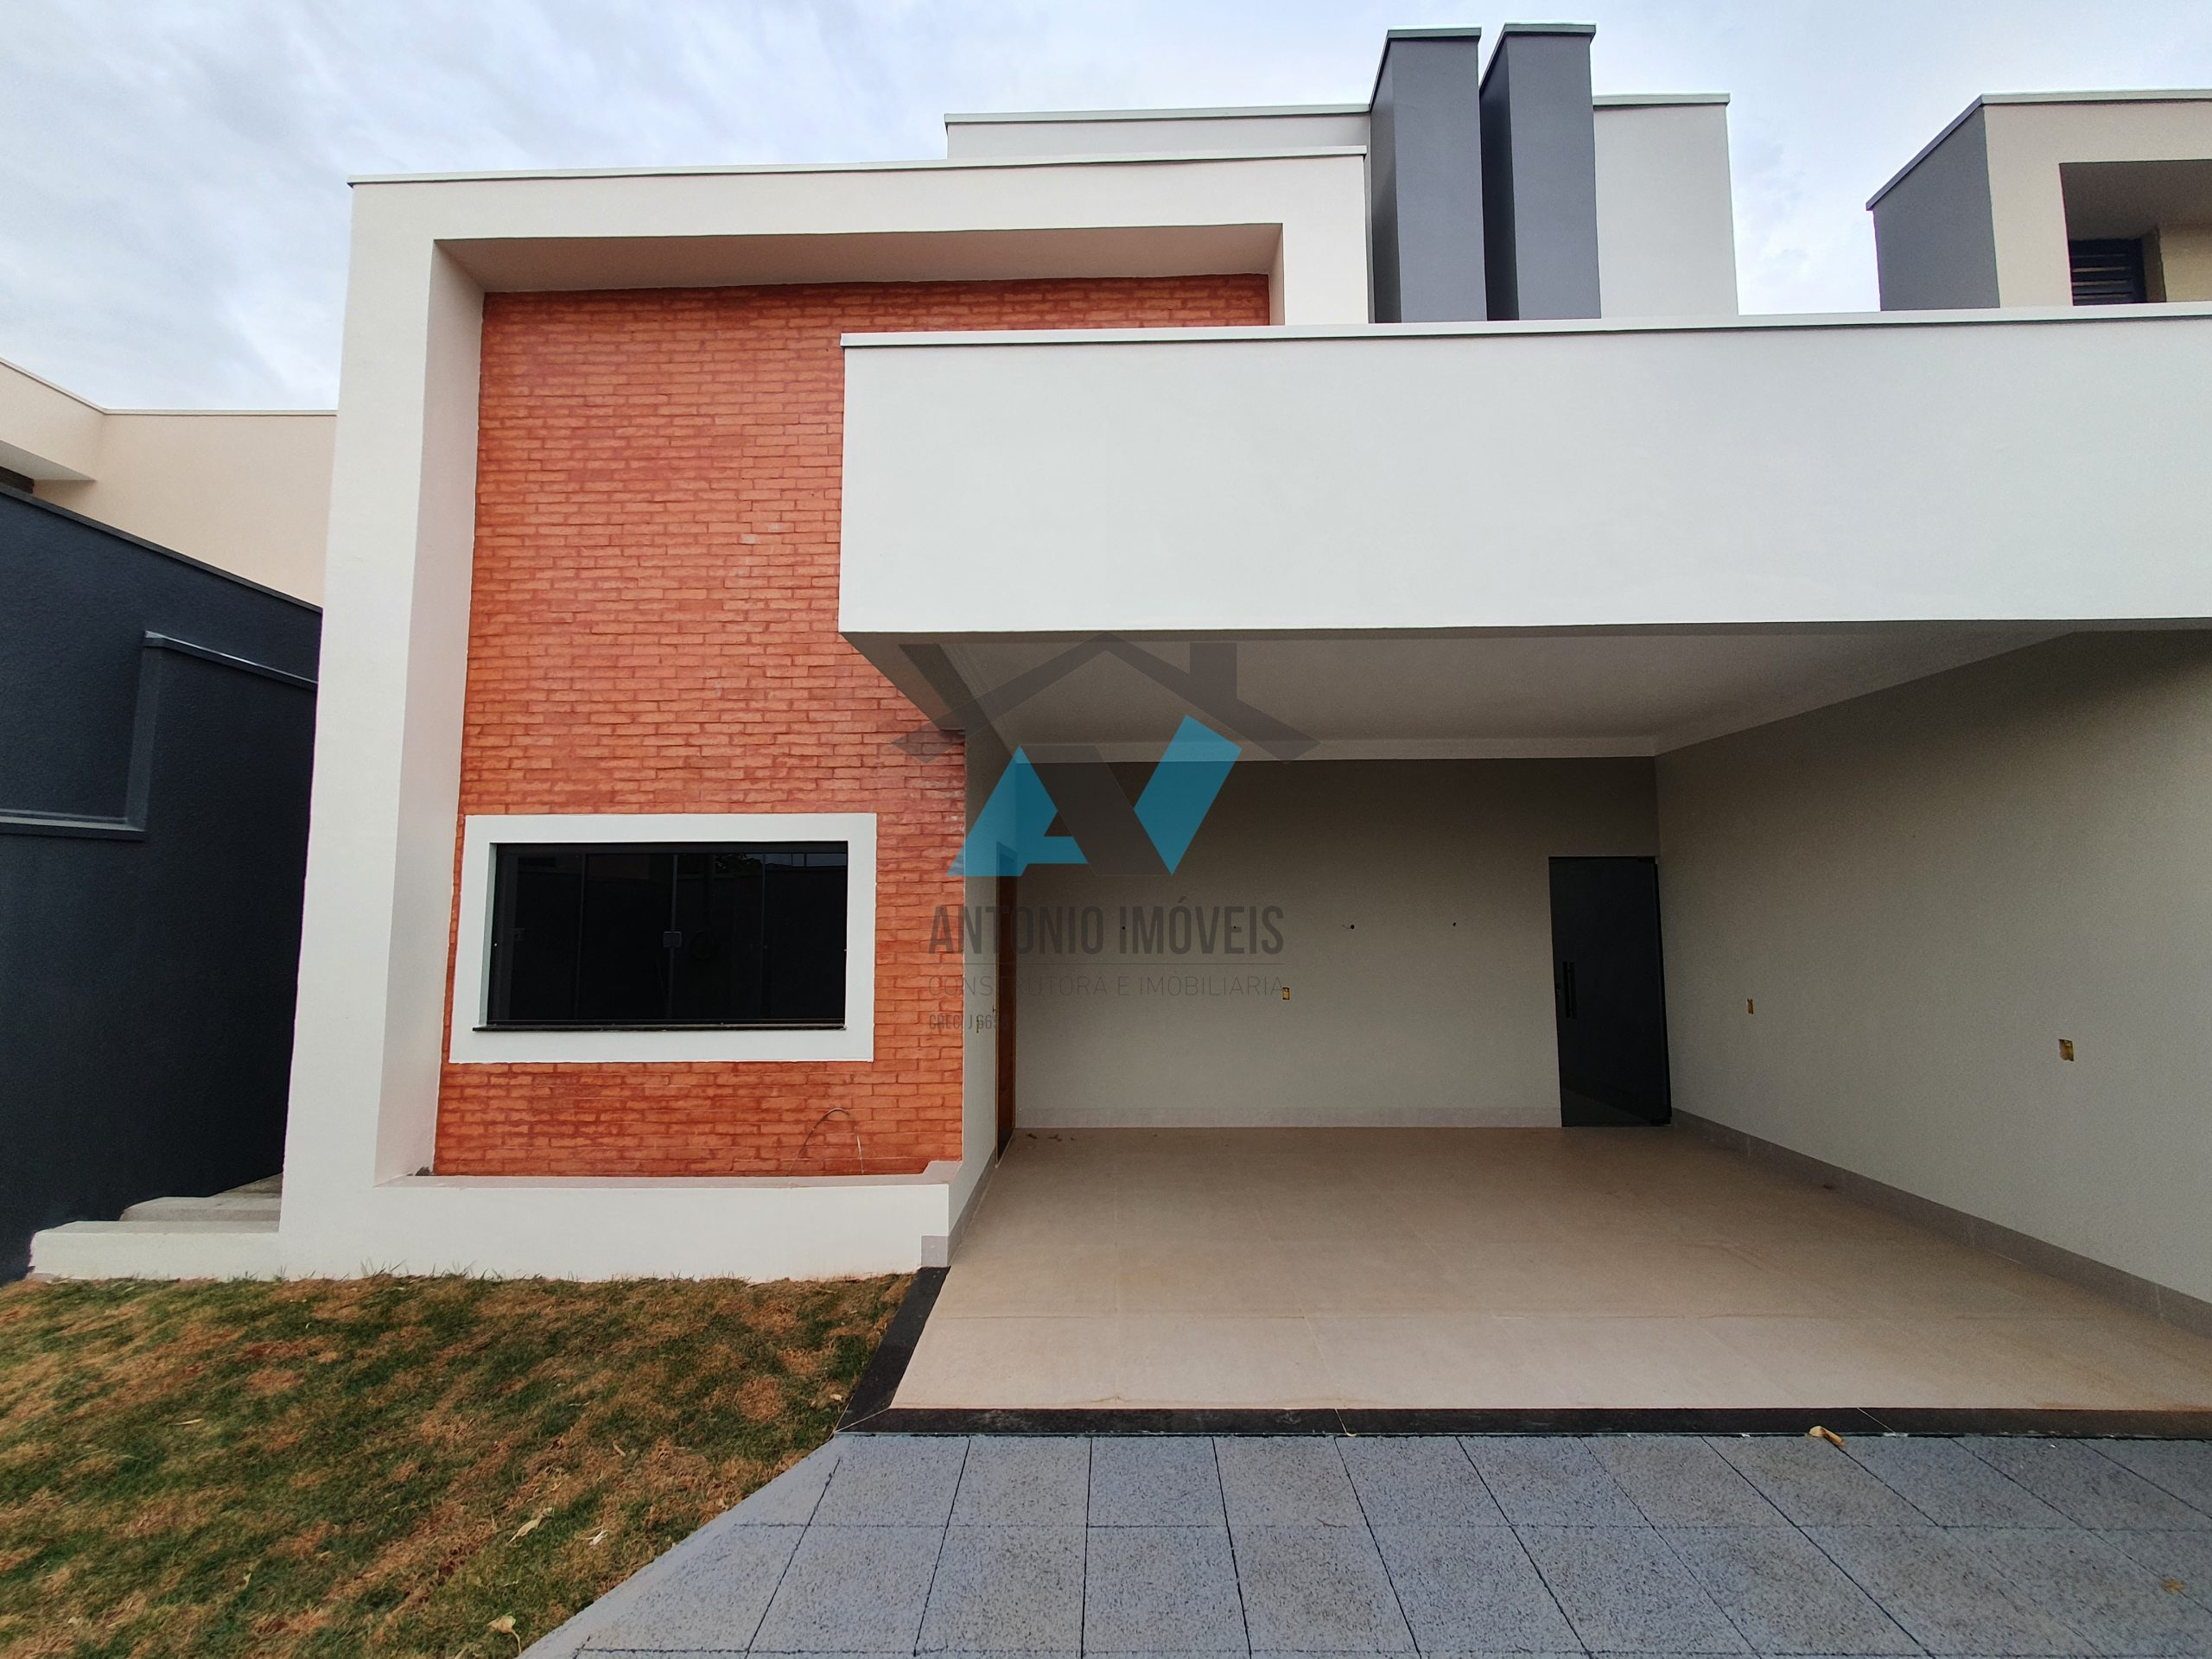 Cod. 073 – Casa no bairro Buritis 4 pronta